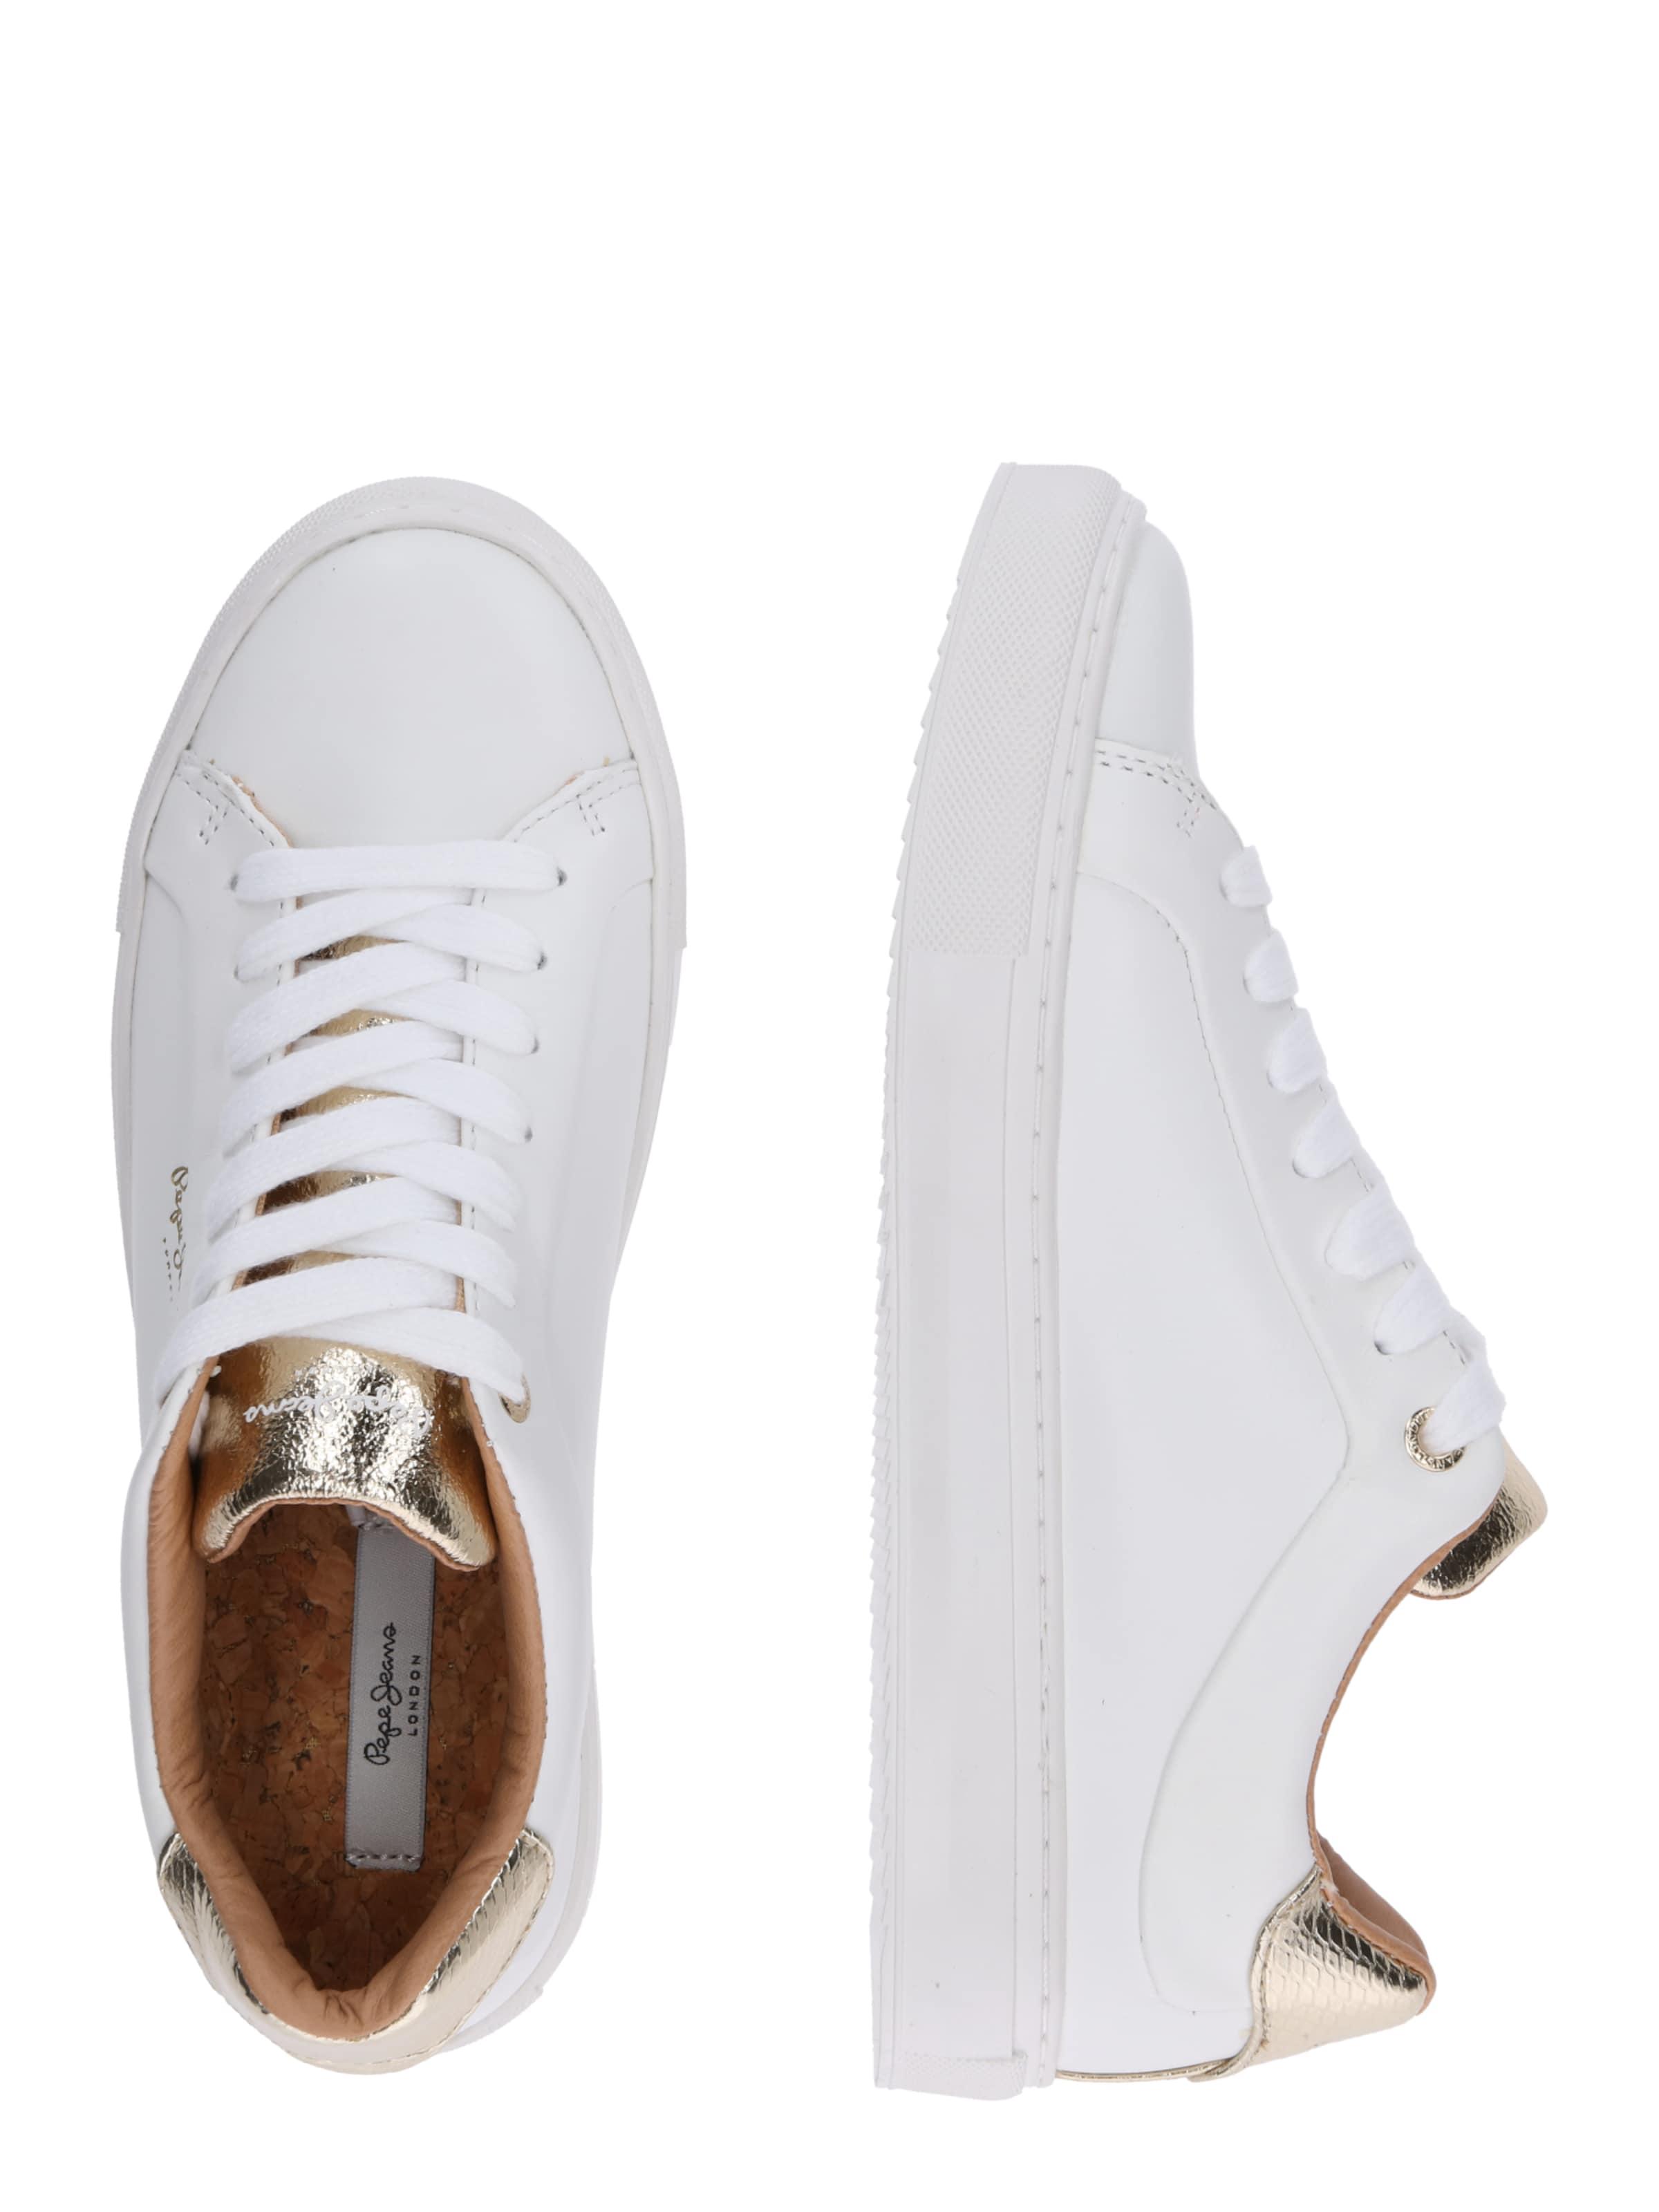 Pepe In Premium' 'adams Jeans Sneaker Weiß I6gYbfy7v